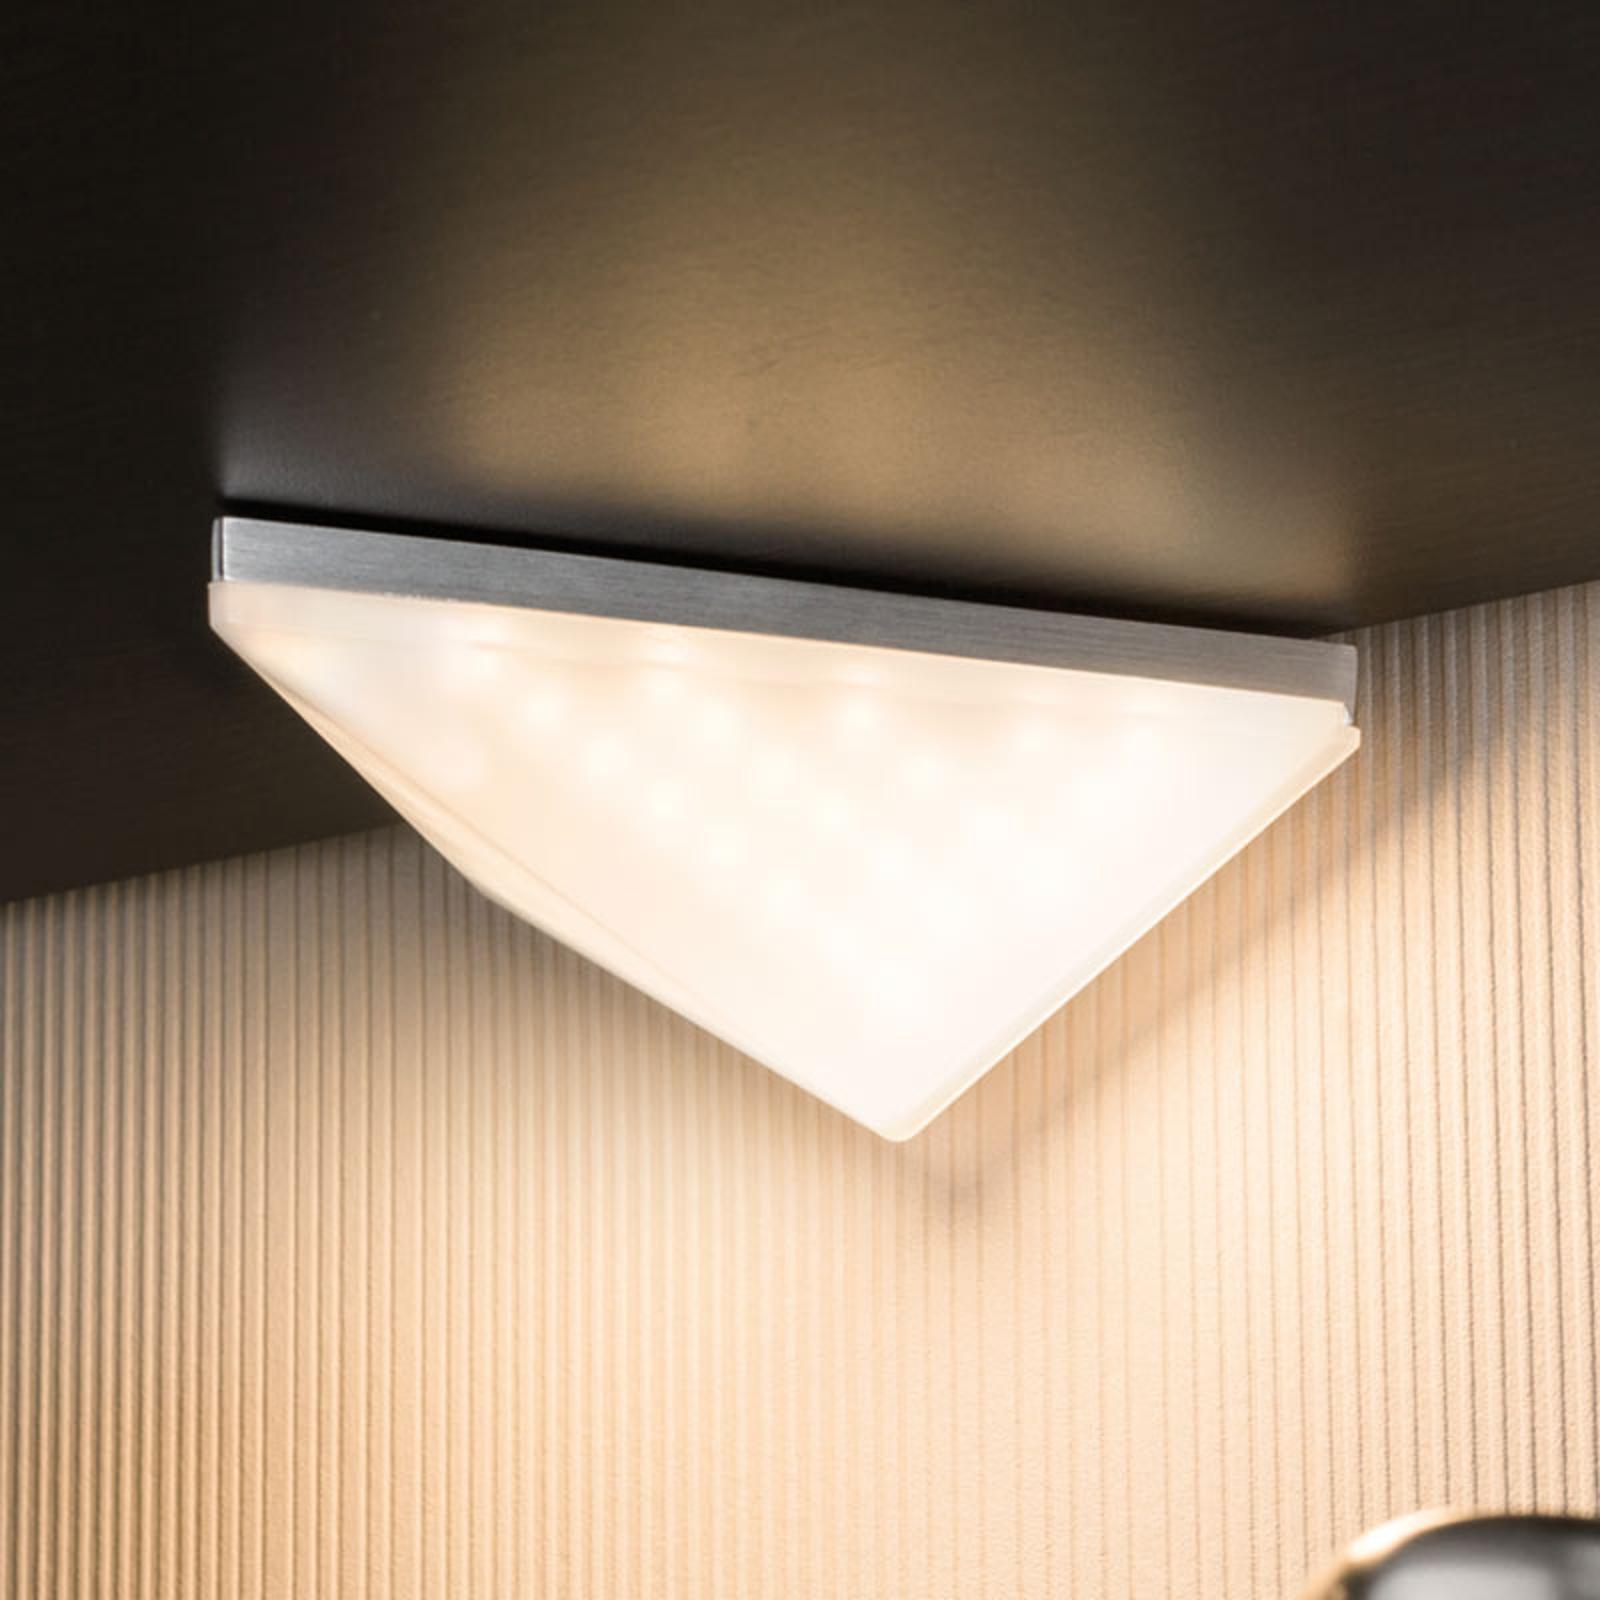 Paulmann Kite lampe sous meuble LED, lot de 2